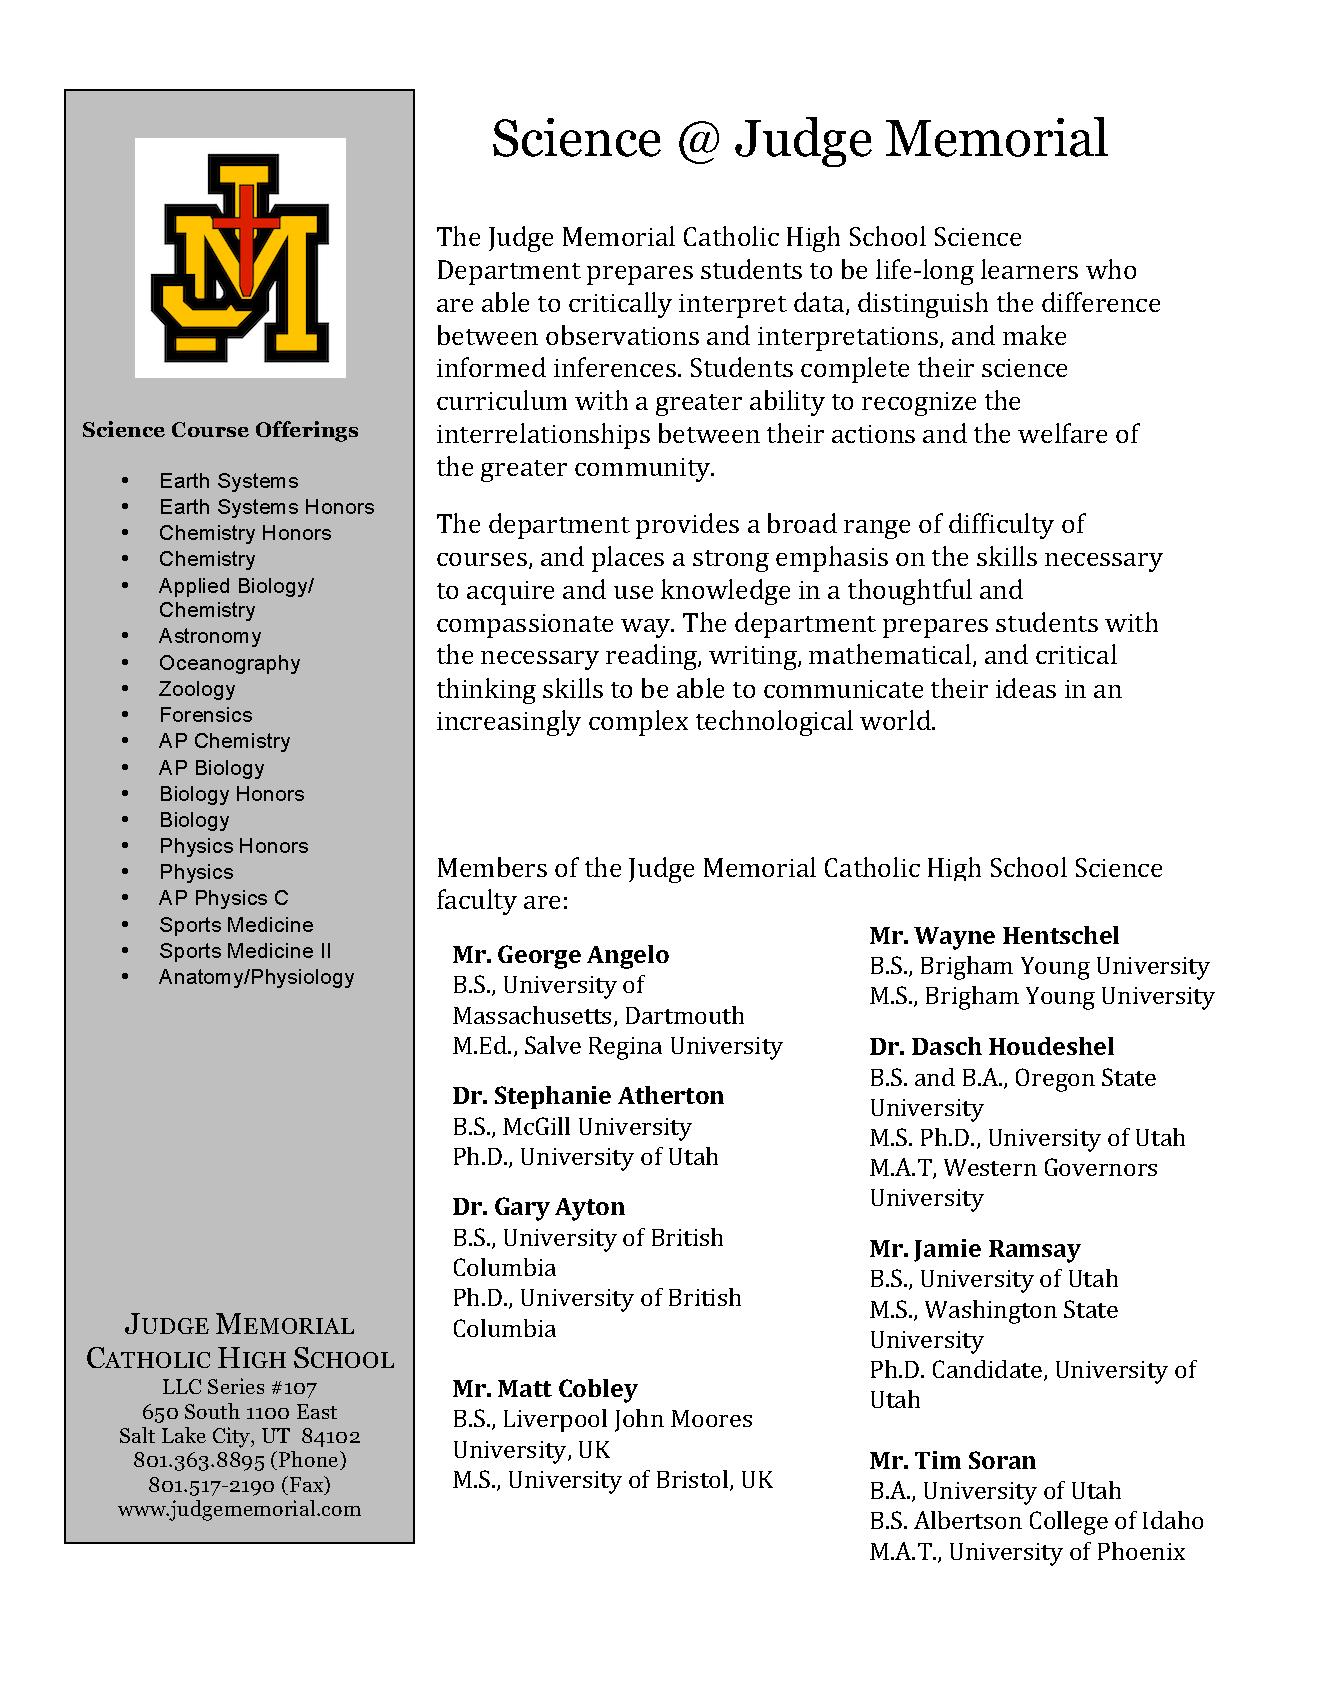 Science Judge Science Judge Memorial Catholic High School